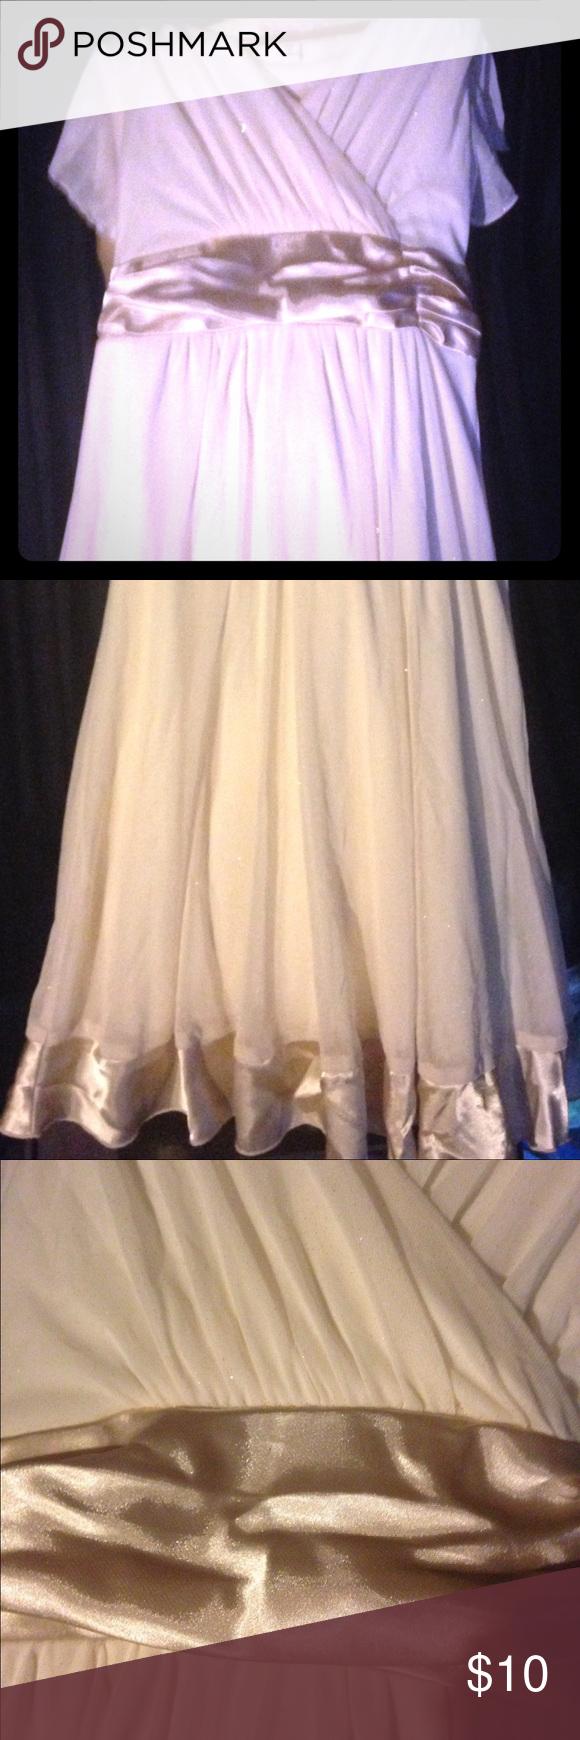 Flower girls dress Beige sparkle floor length girls size 12 runs small more like an 8-10. Dresses Wedding